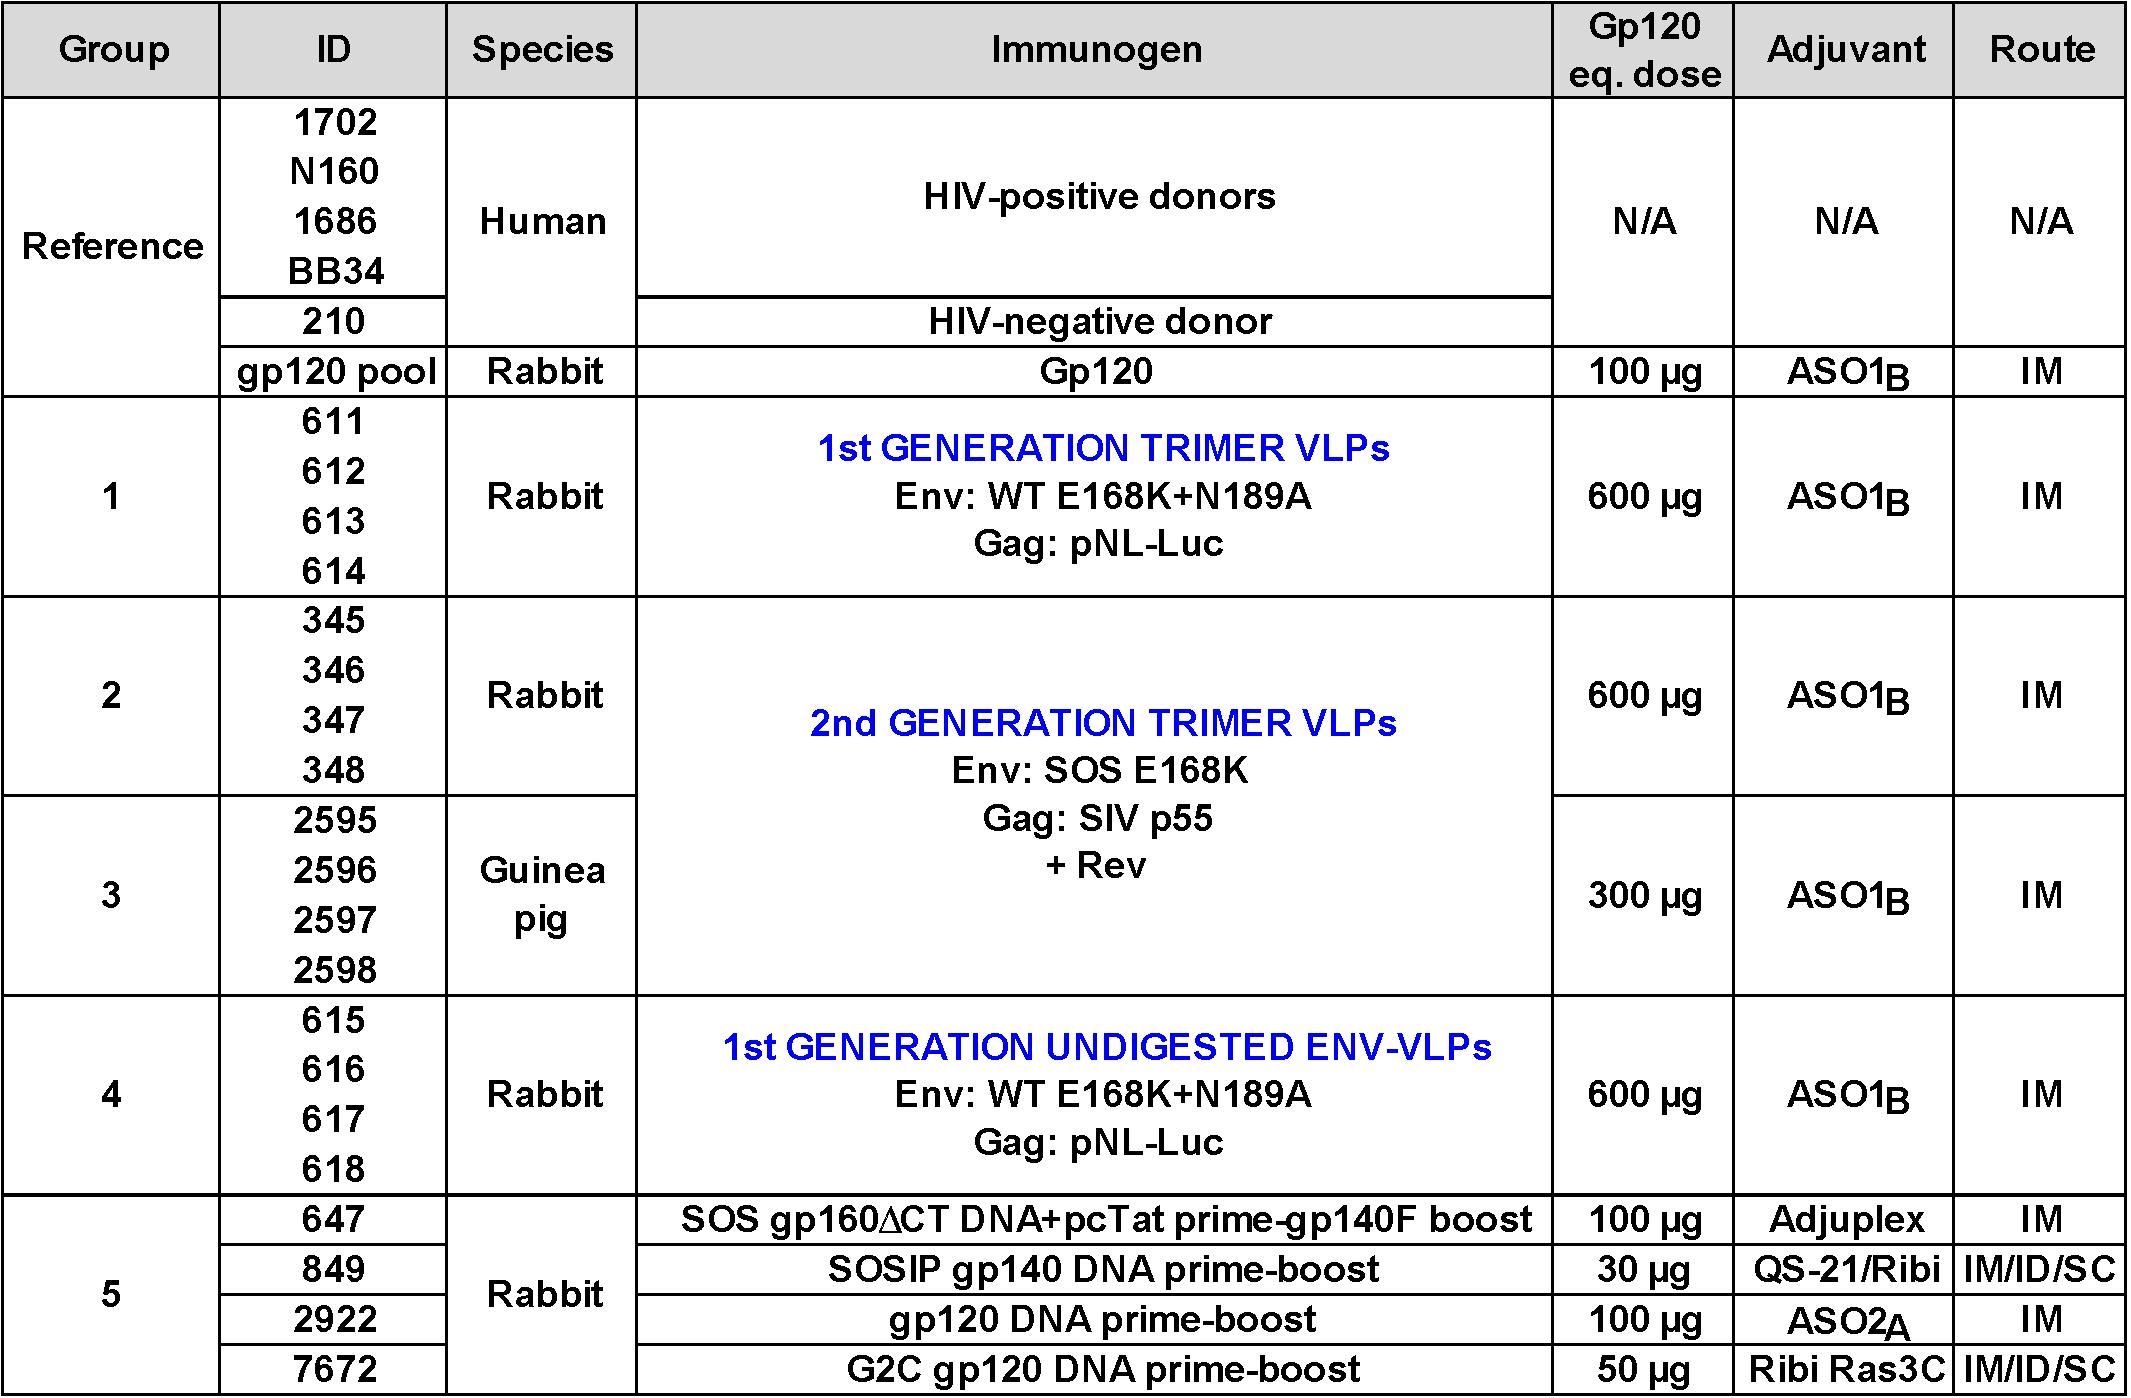 Overview of human plasmas and animal sera.